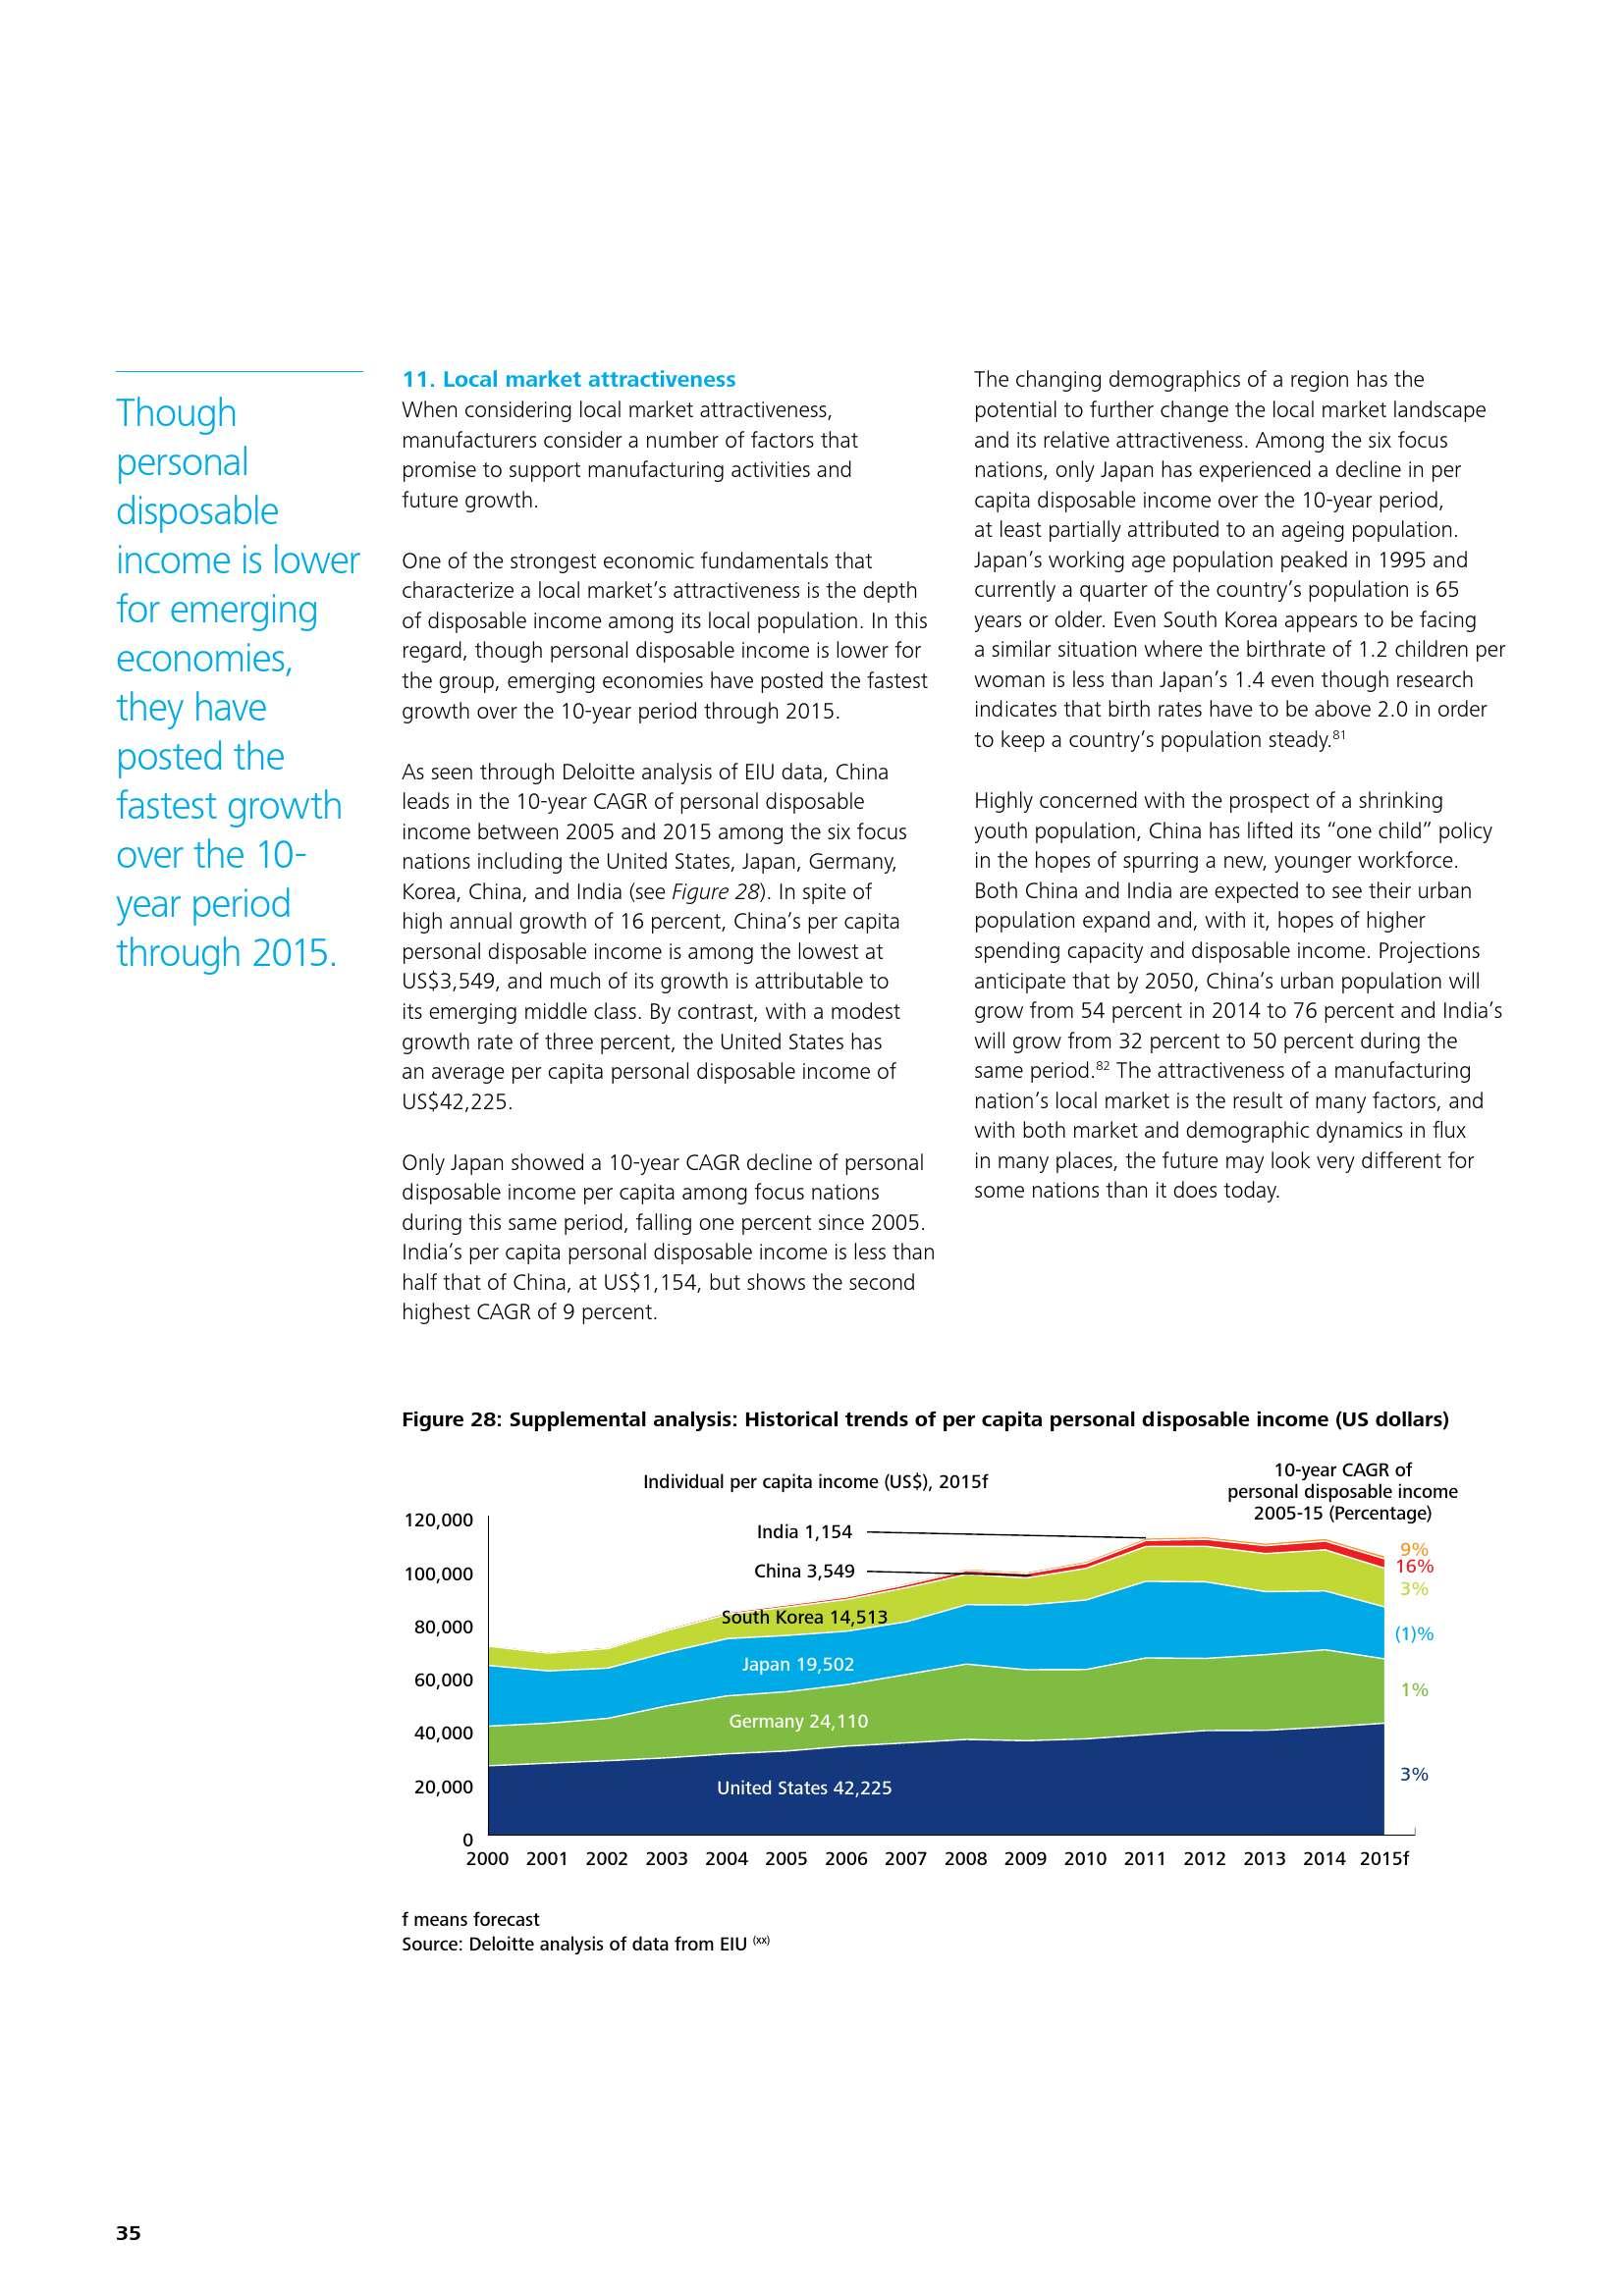 deloitte-cn-global-mfg-competitiveness-index-2016-en-160401_000038